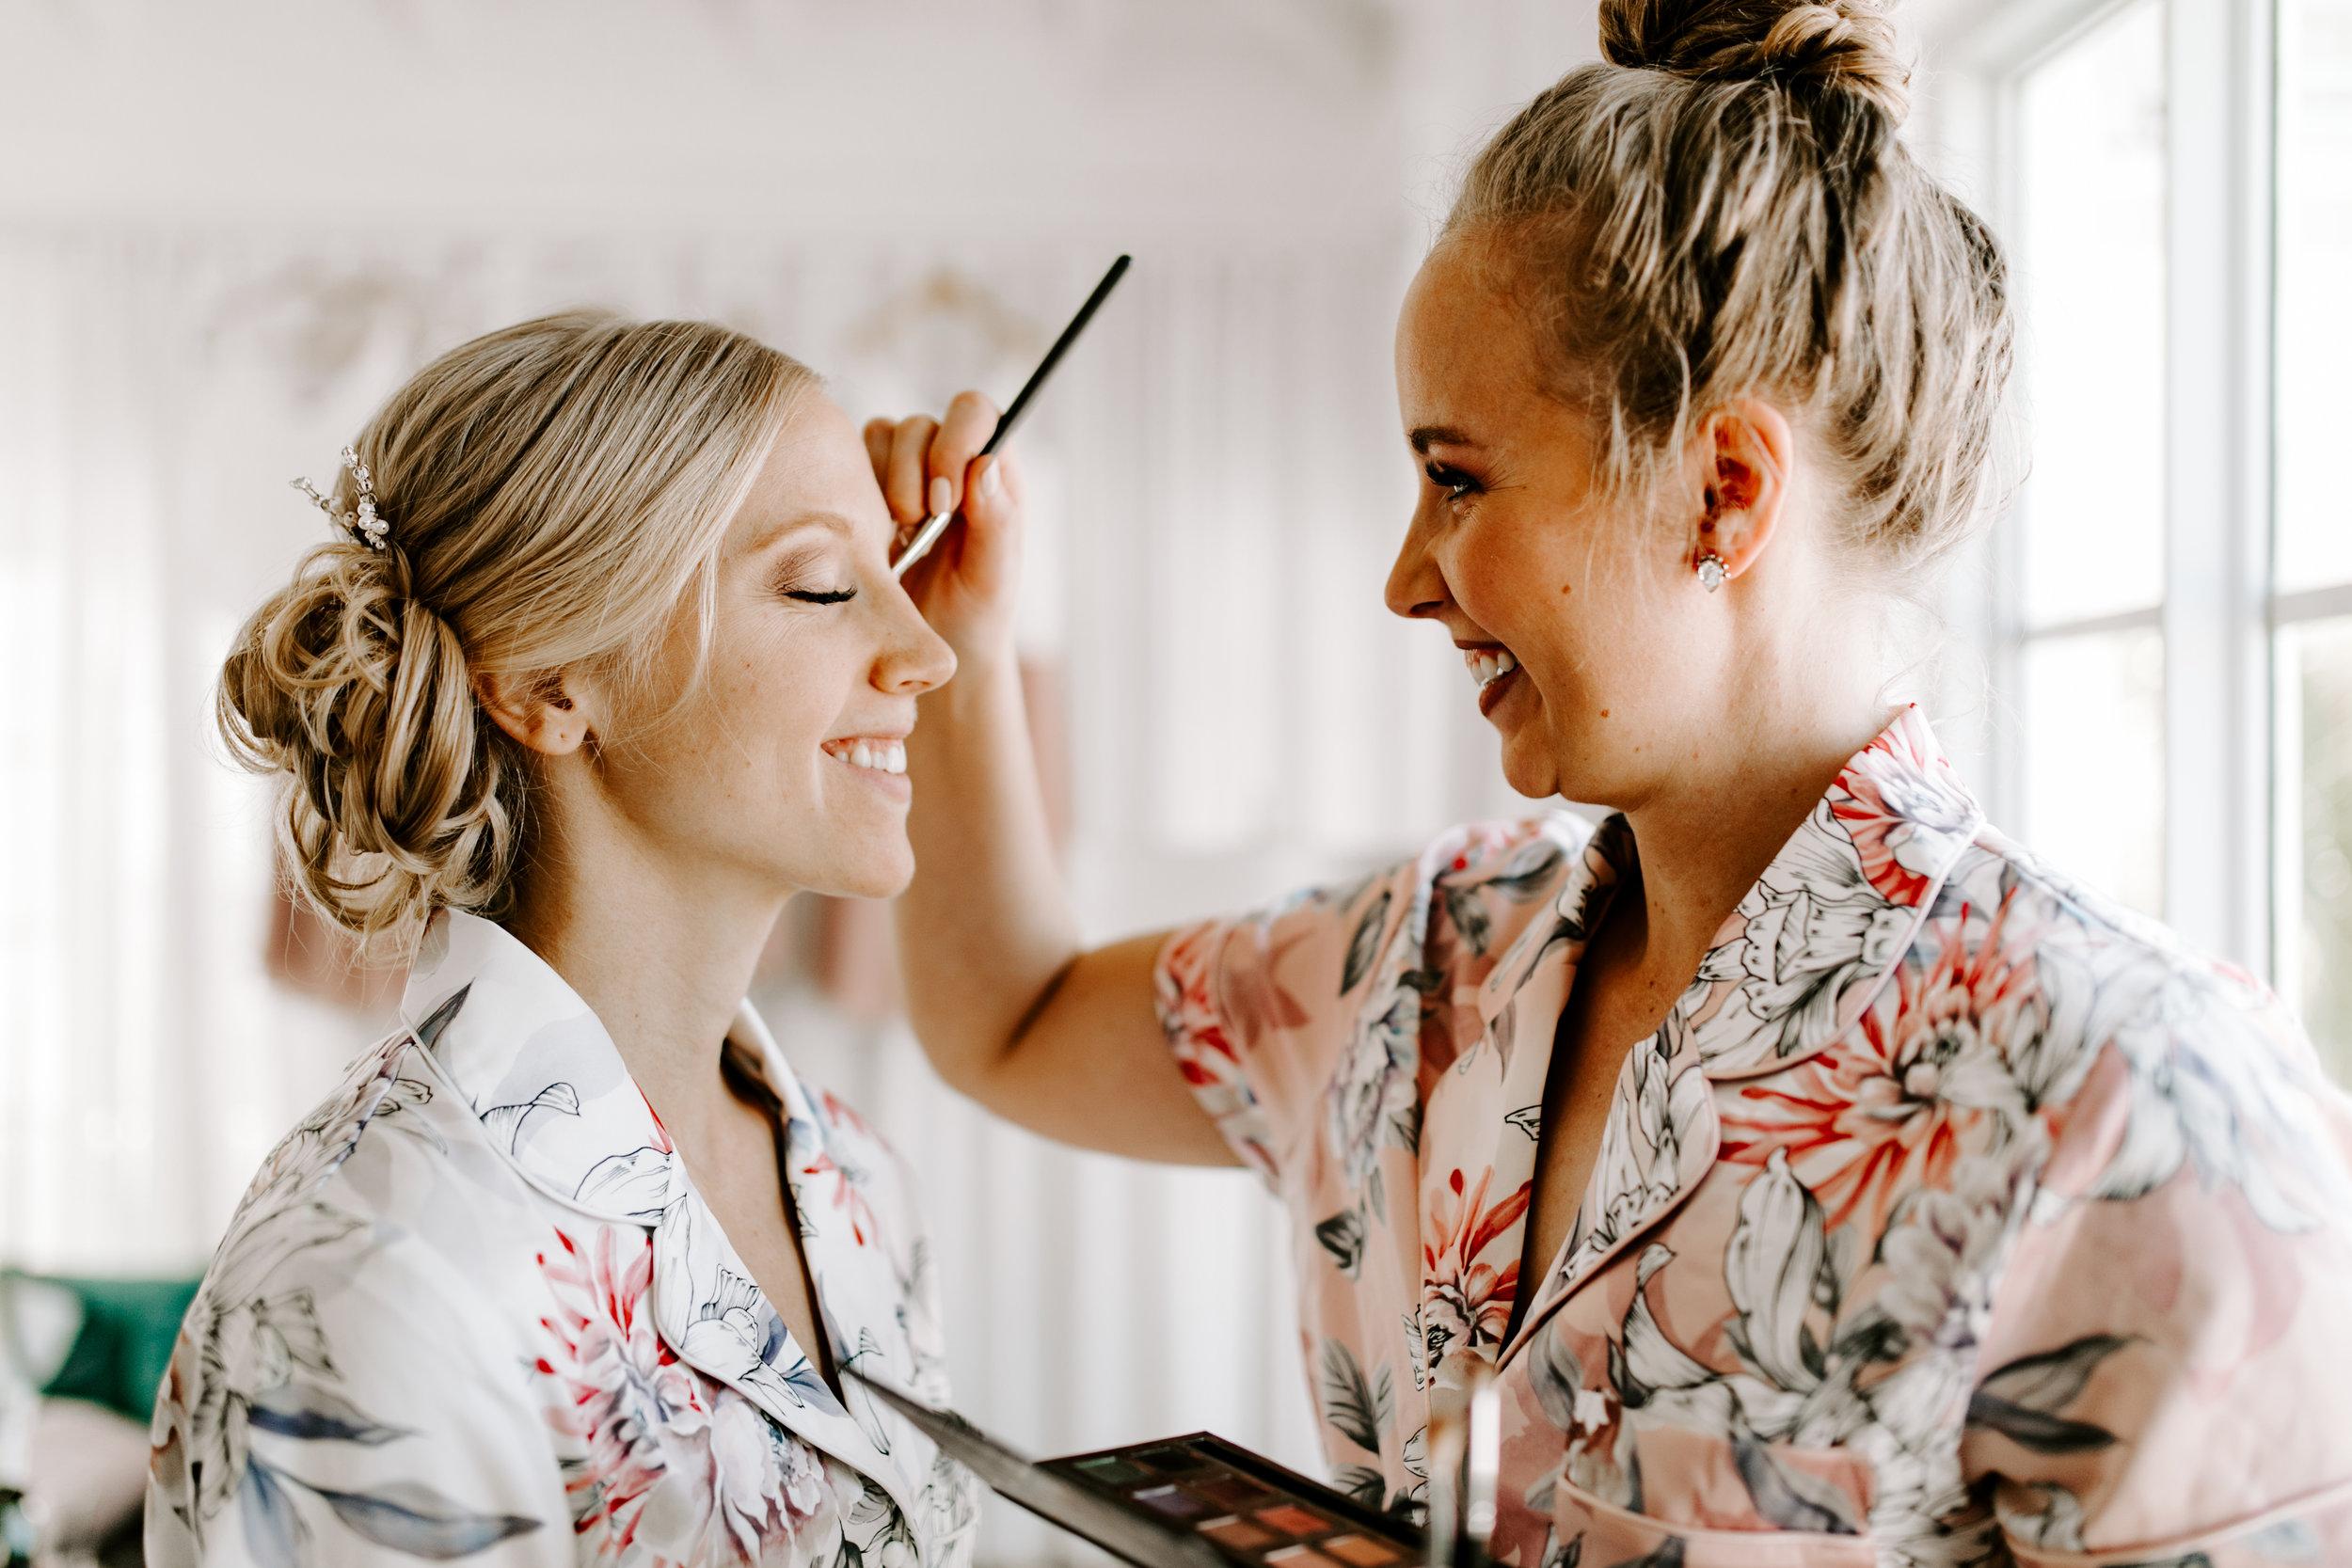 wedding makeup, makeup artist, wedding day, bride, destination wedding, beach wedding, jamaica wedding, getting ready, define fettle